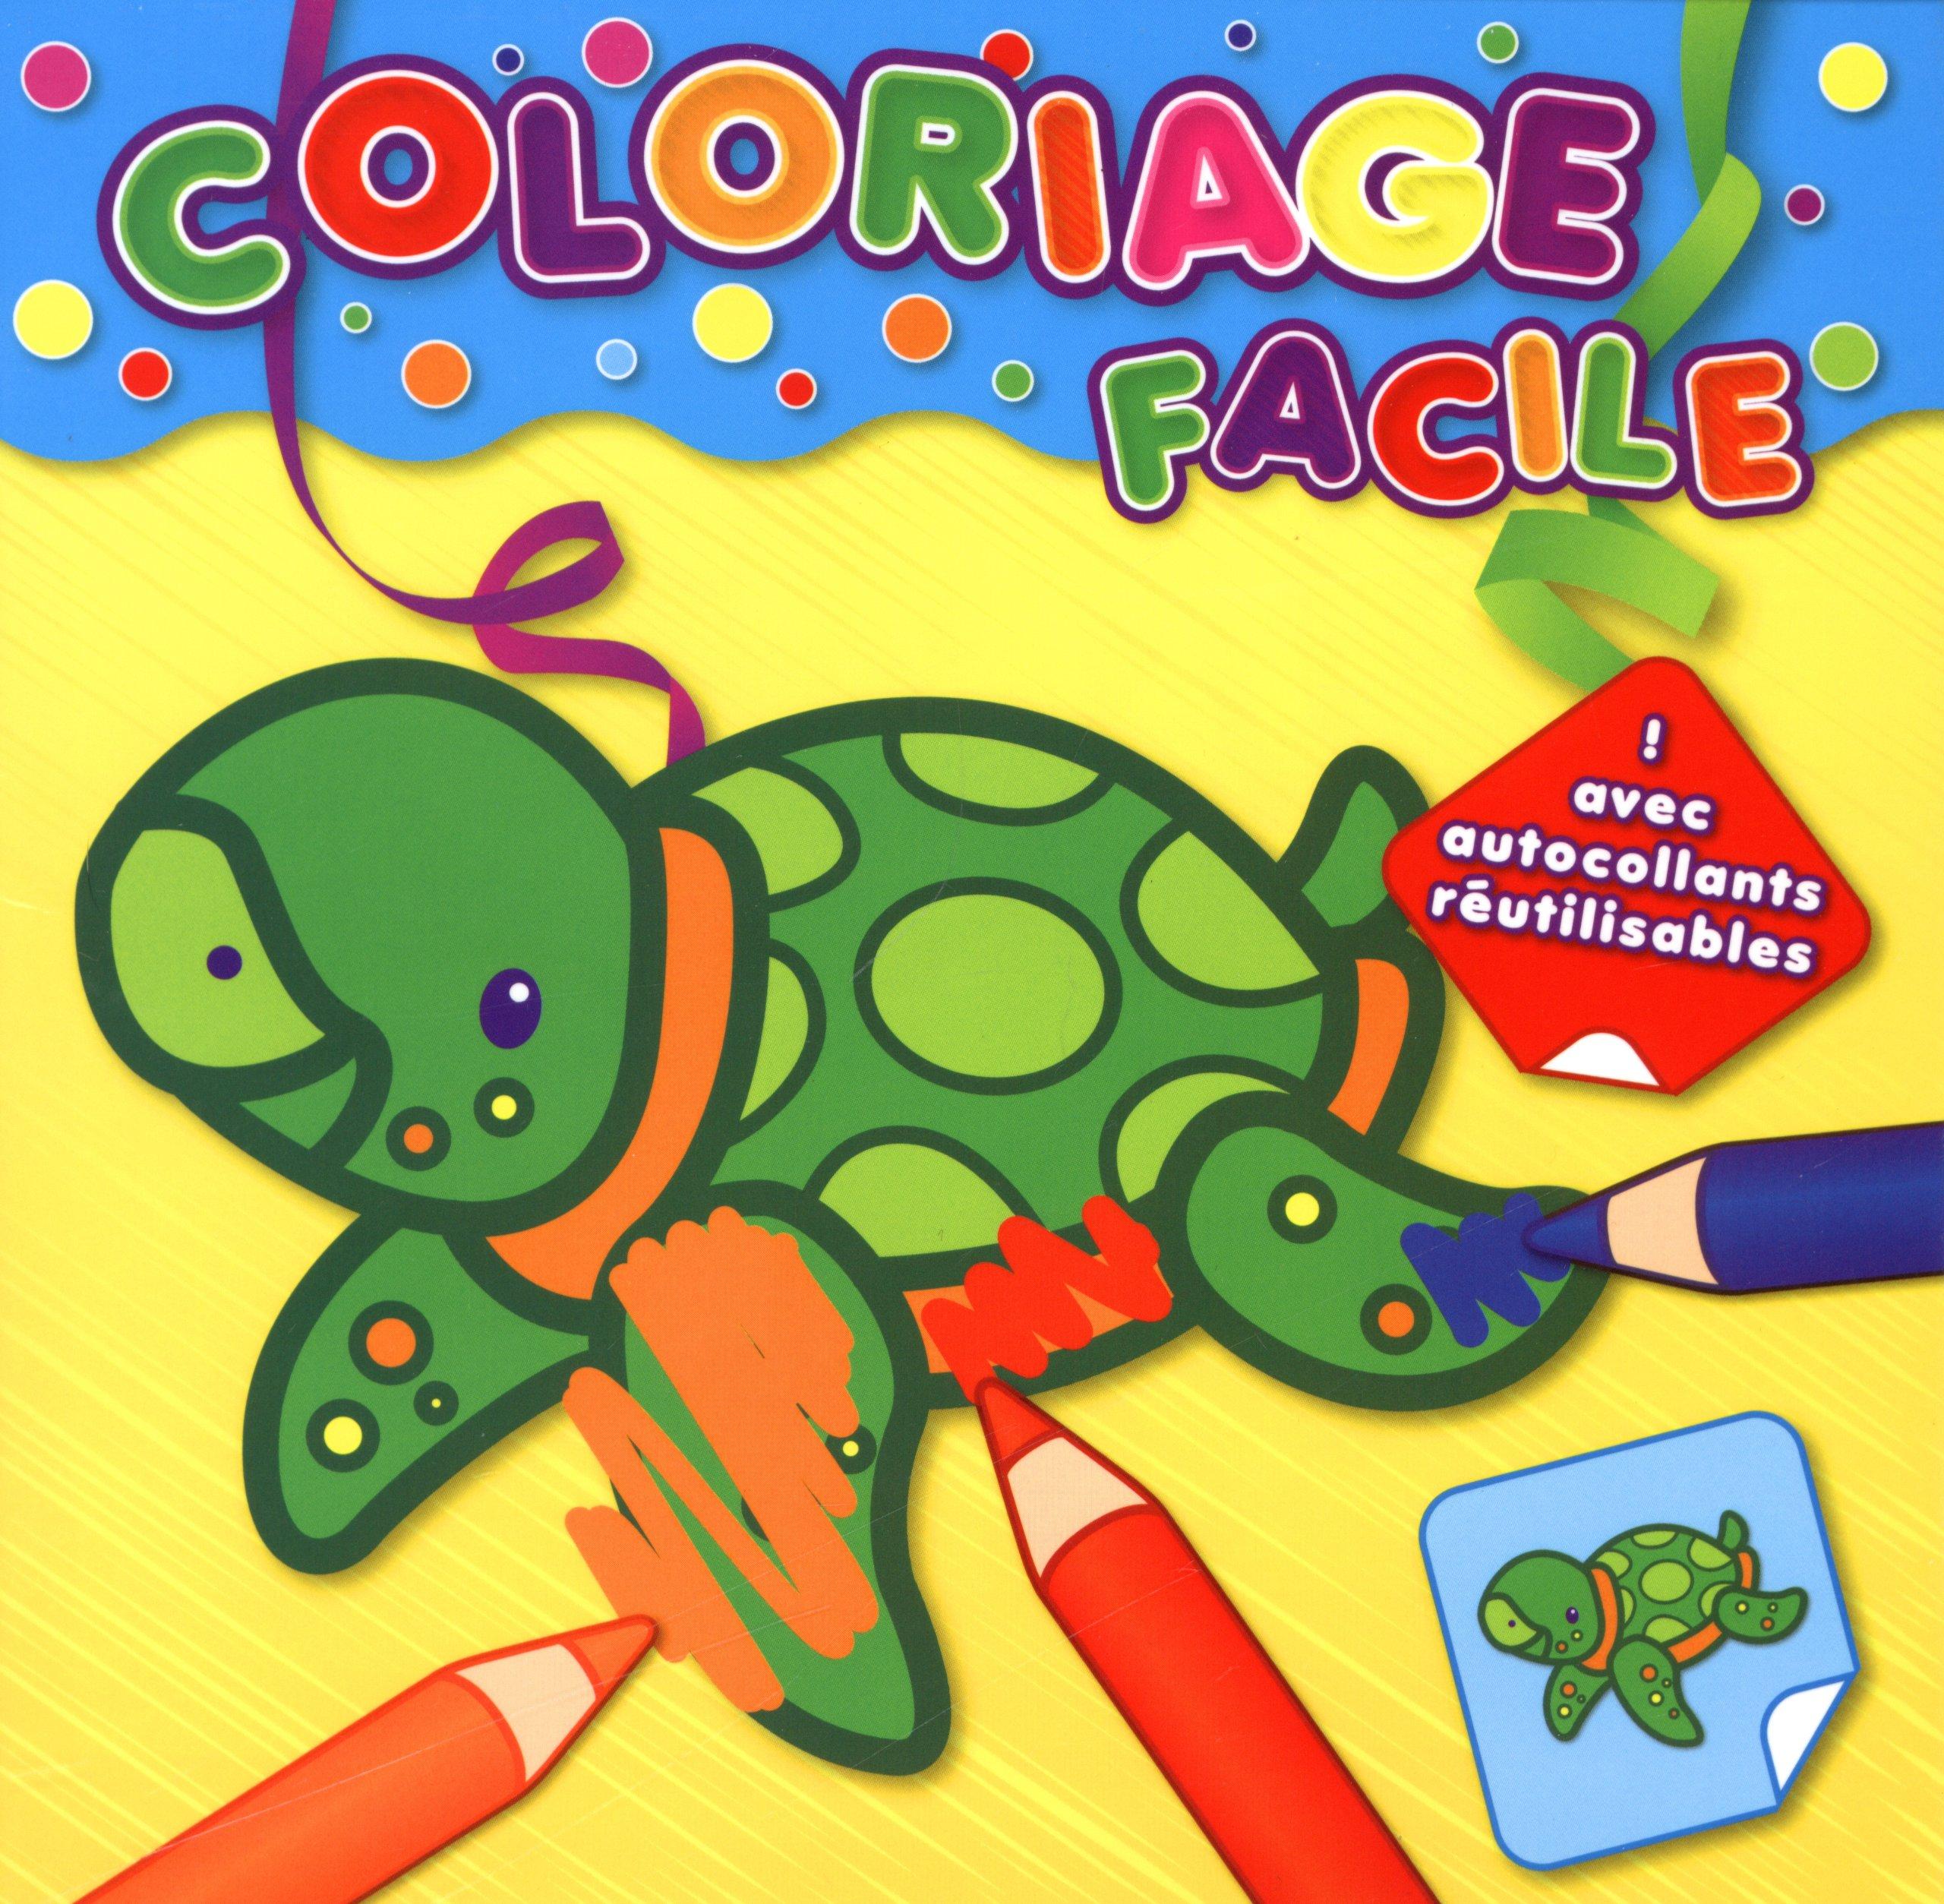 Tortue Coloriage Facile 9789461517715 Amazon Com Books